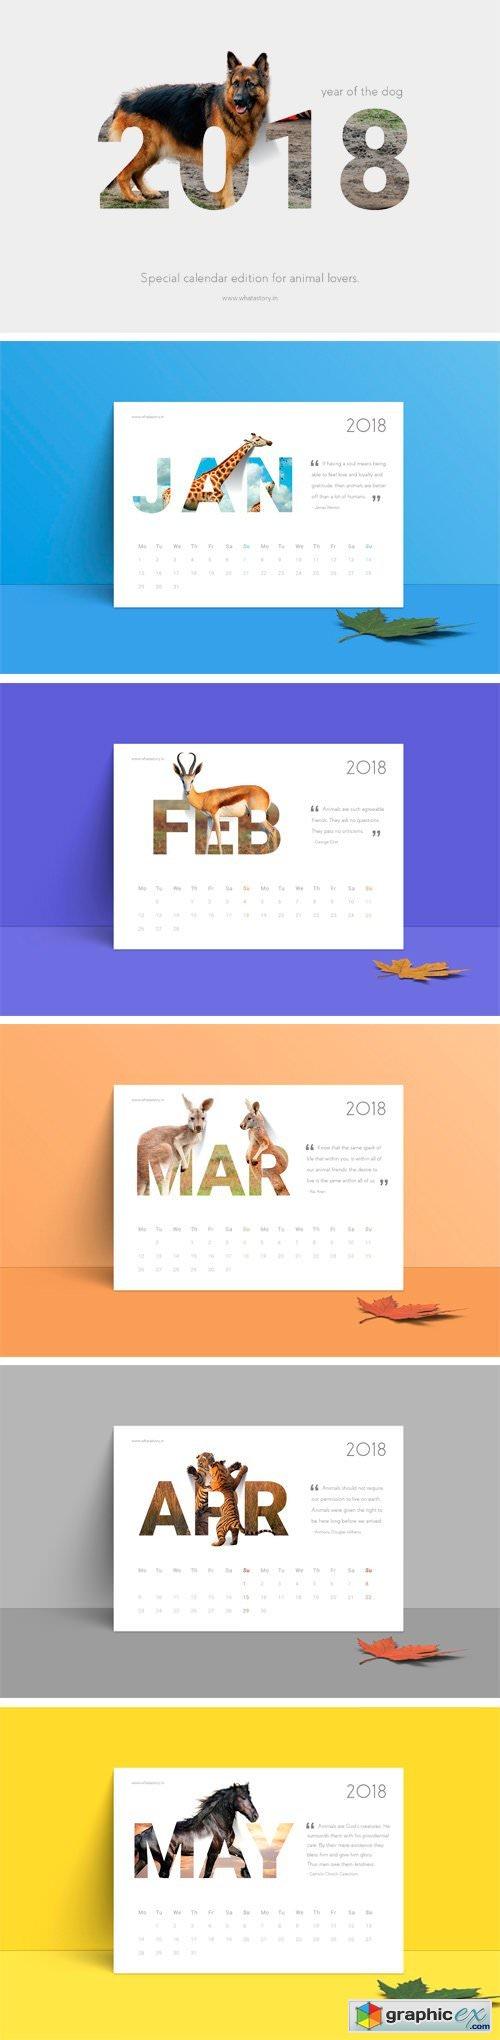 2018 Calendar   Animals